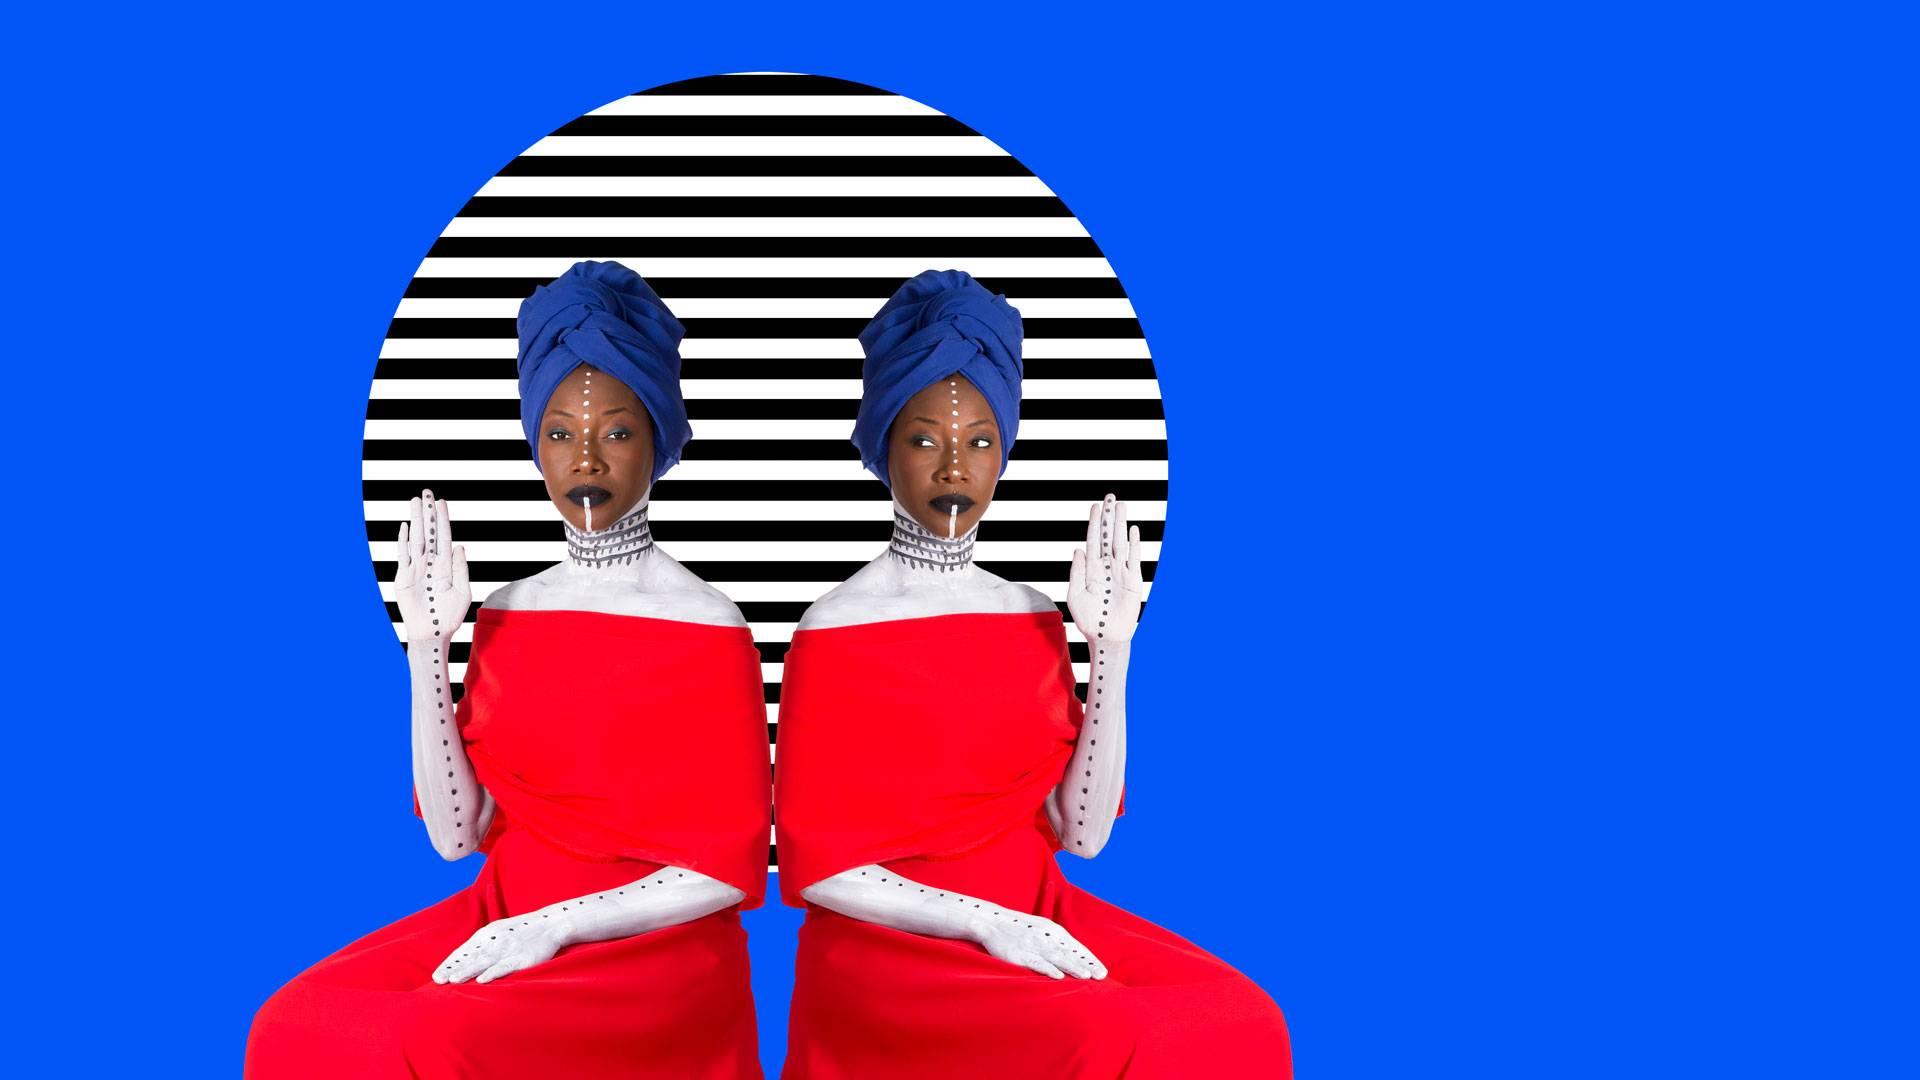 Fatoumata Diawara live at Suds,à Arles Festival, on Thursday July 11, 2019